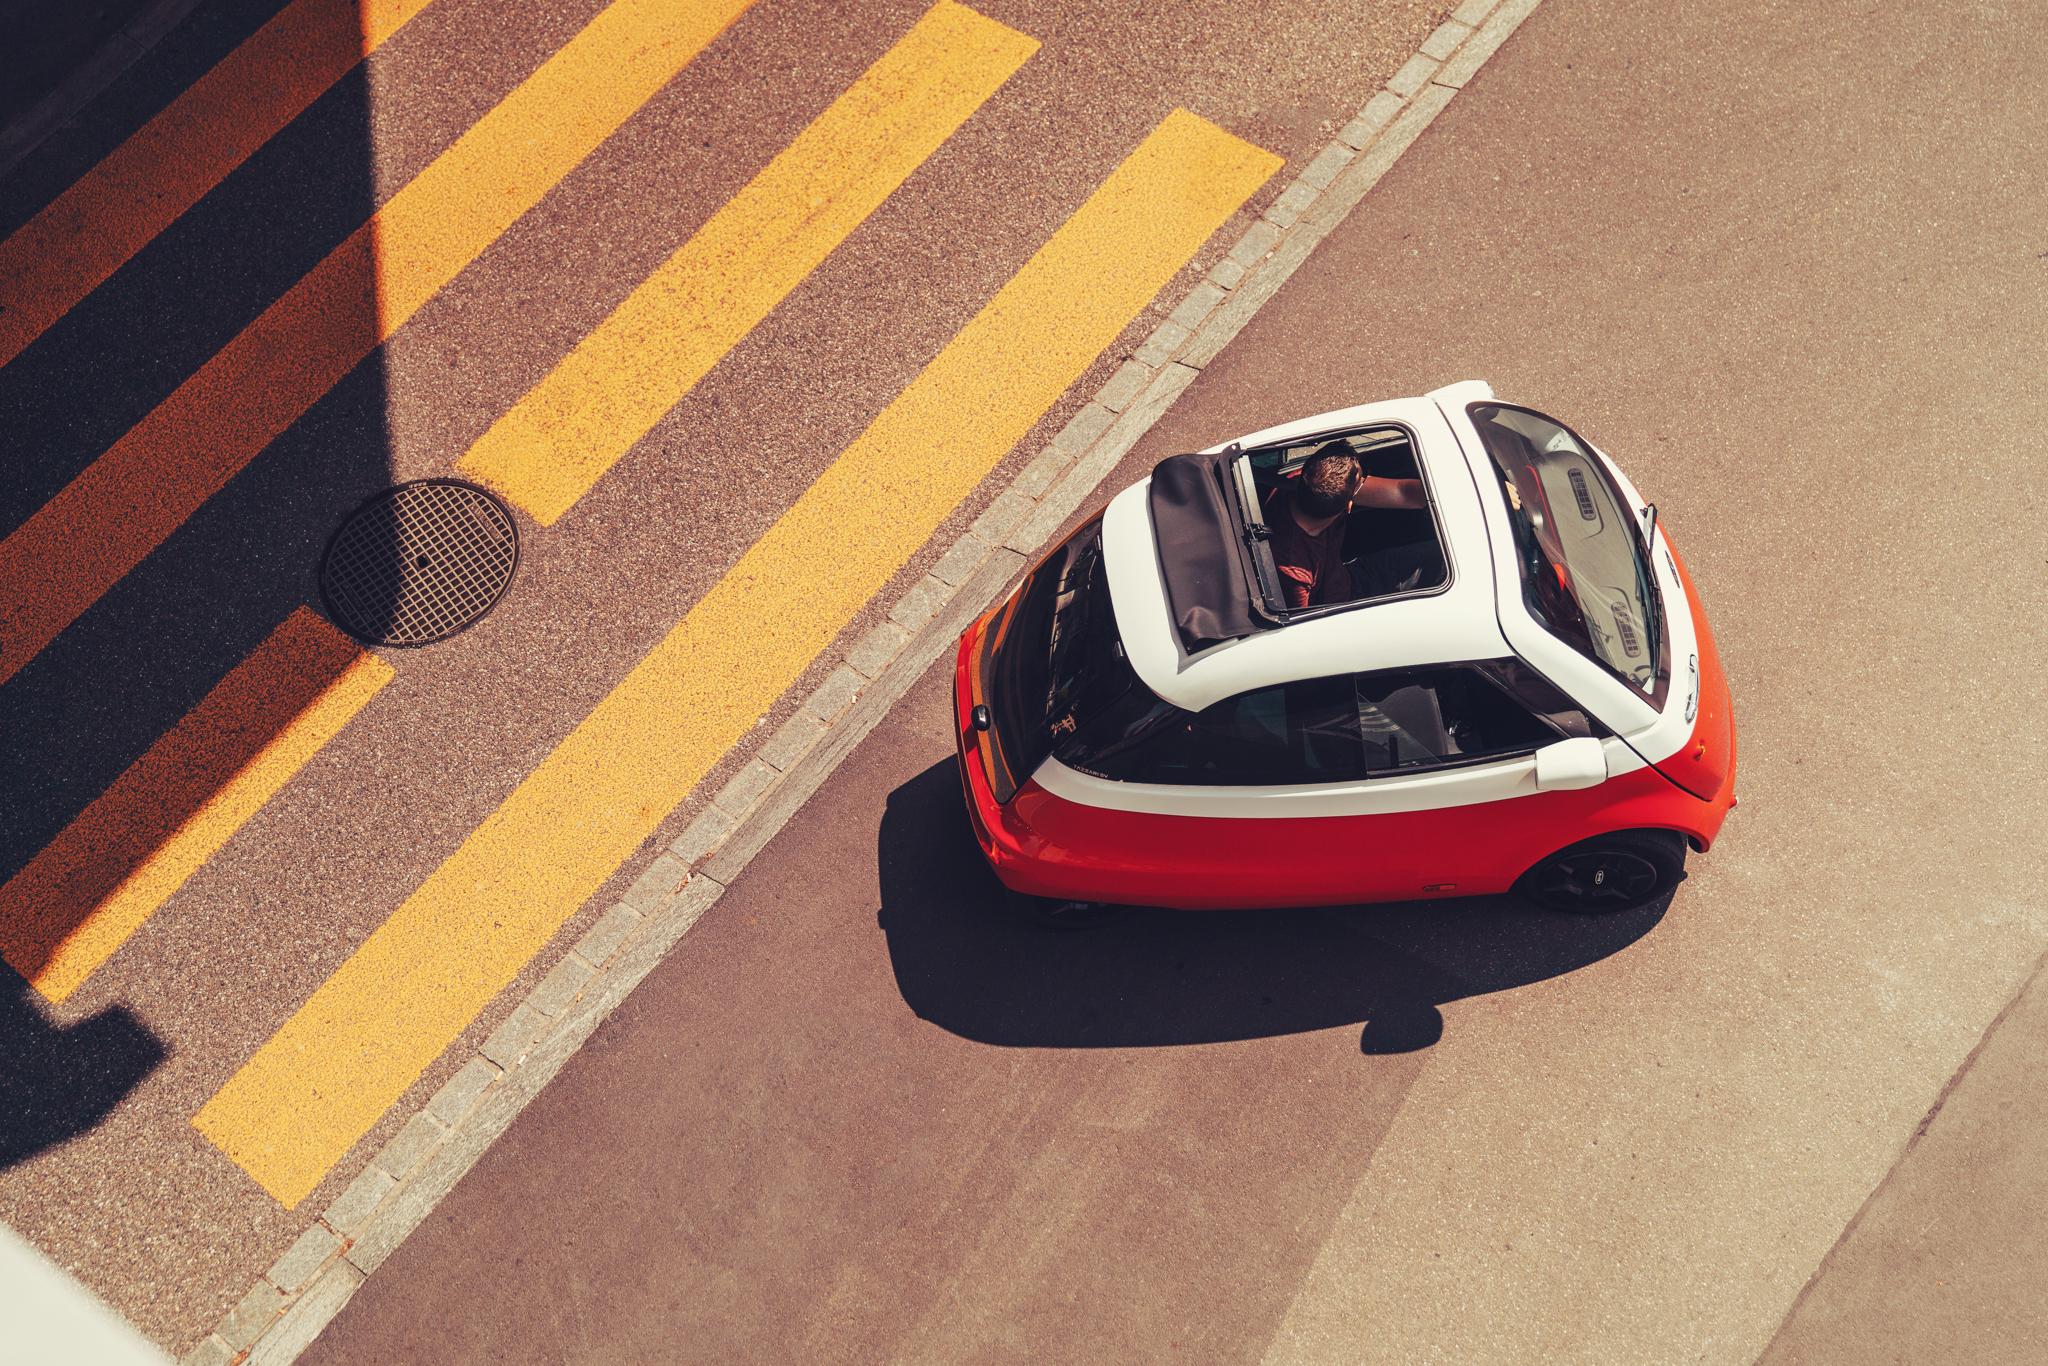 RP - Microlino EV Zurich Top Gear-3.jpg